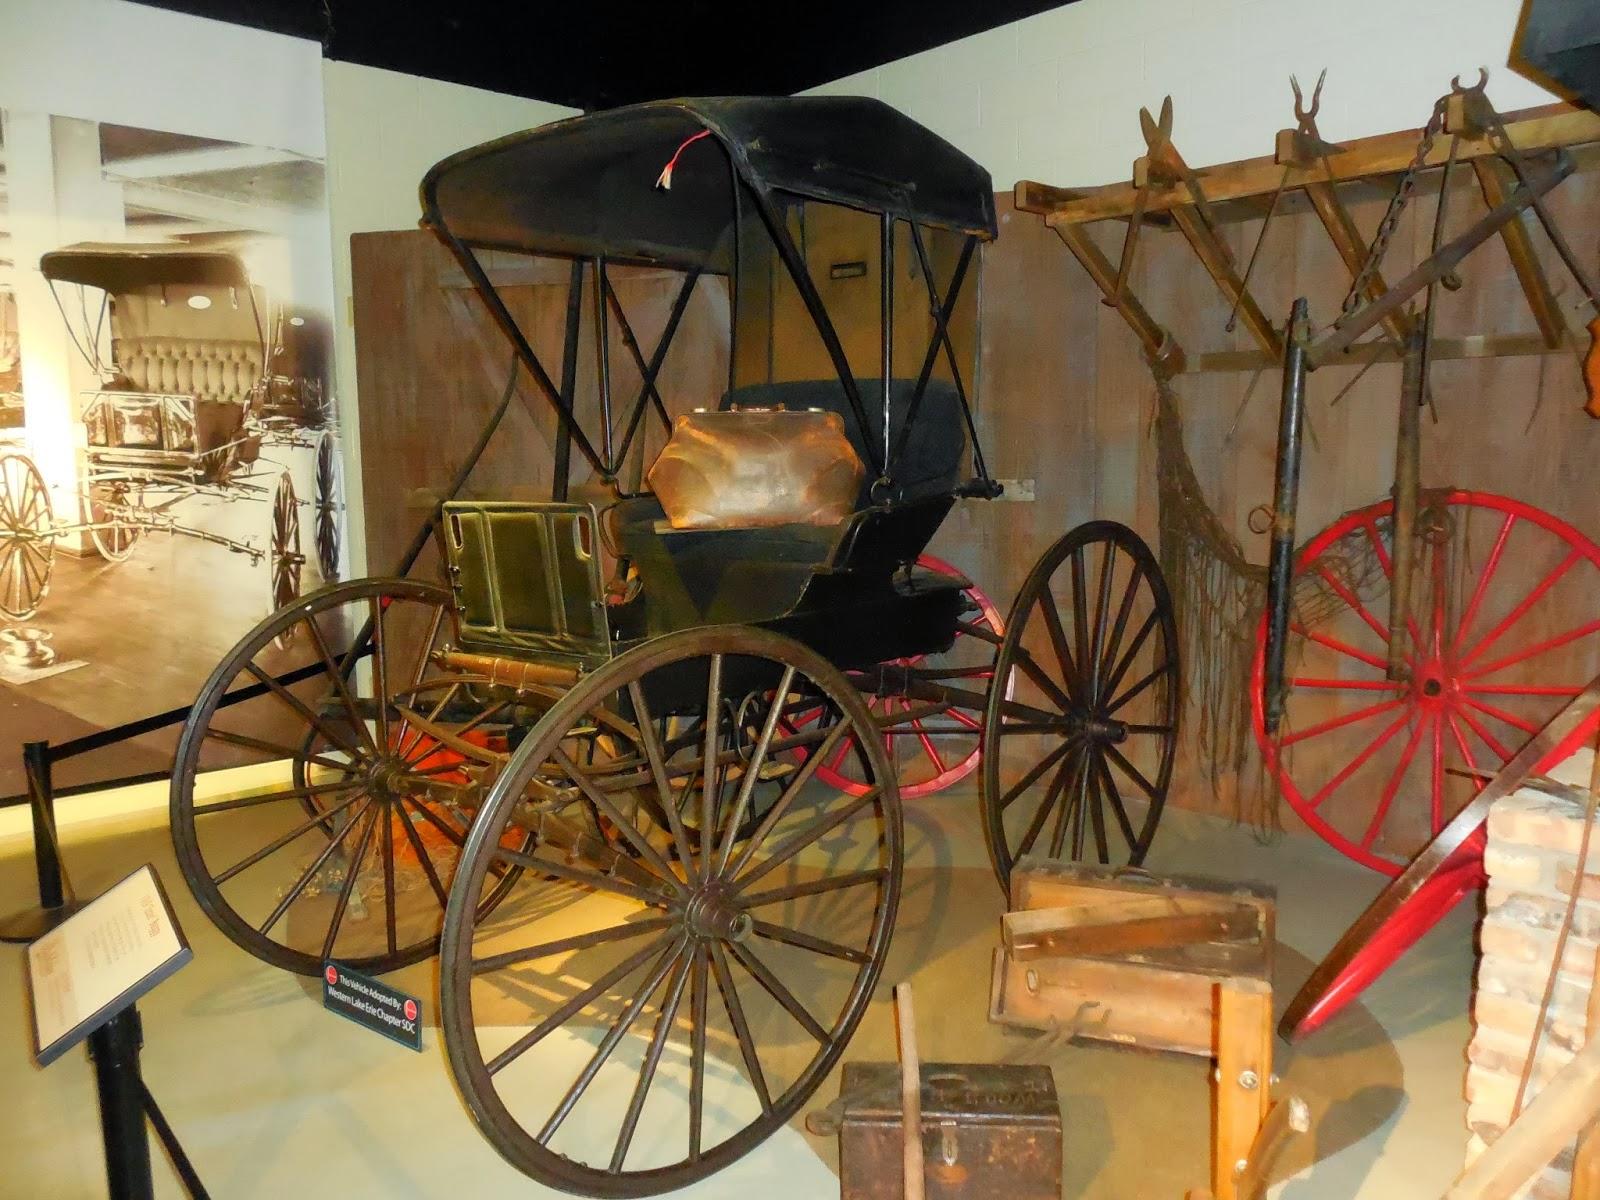 2dodges2go 9 19 13 Studebaker National Museum